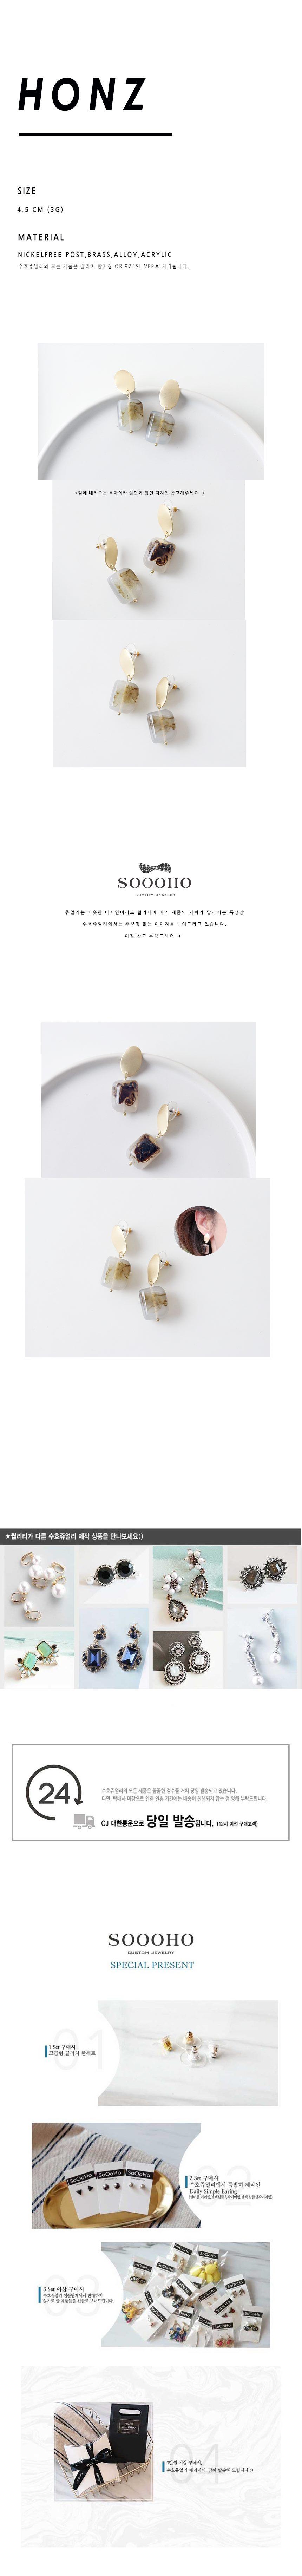 honz 호마이카 무광골드 드롭귀걸이 - 수호쥬얼리, 14,500원, 진주/원석, 드롭귀걸이